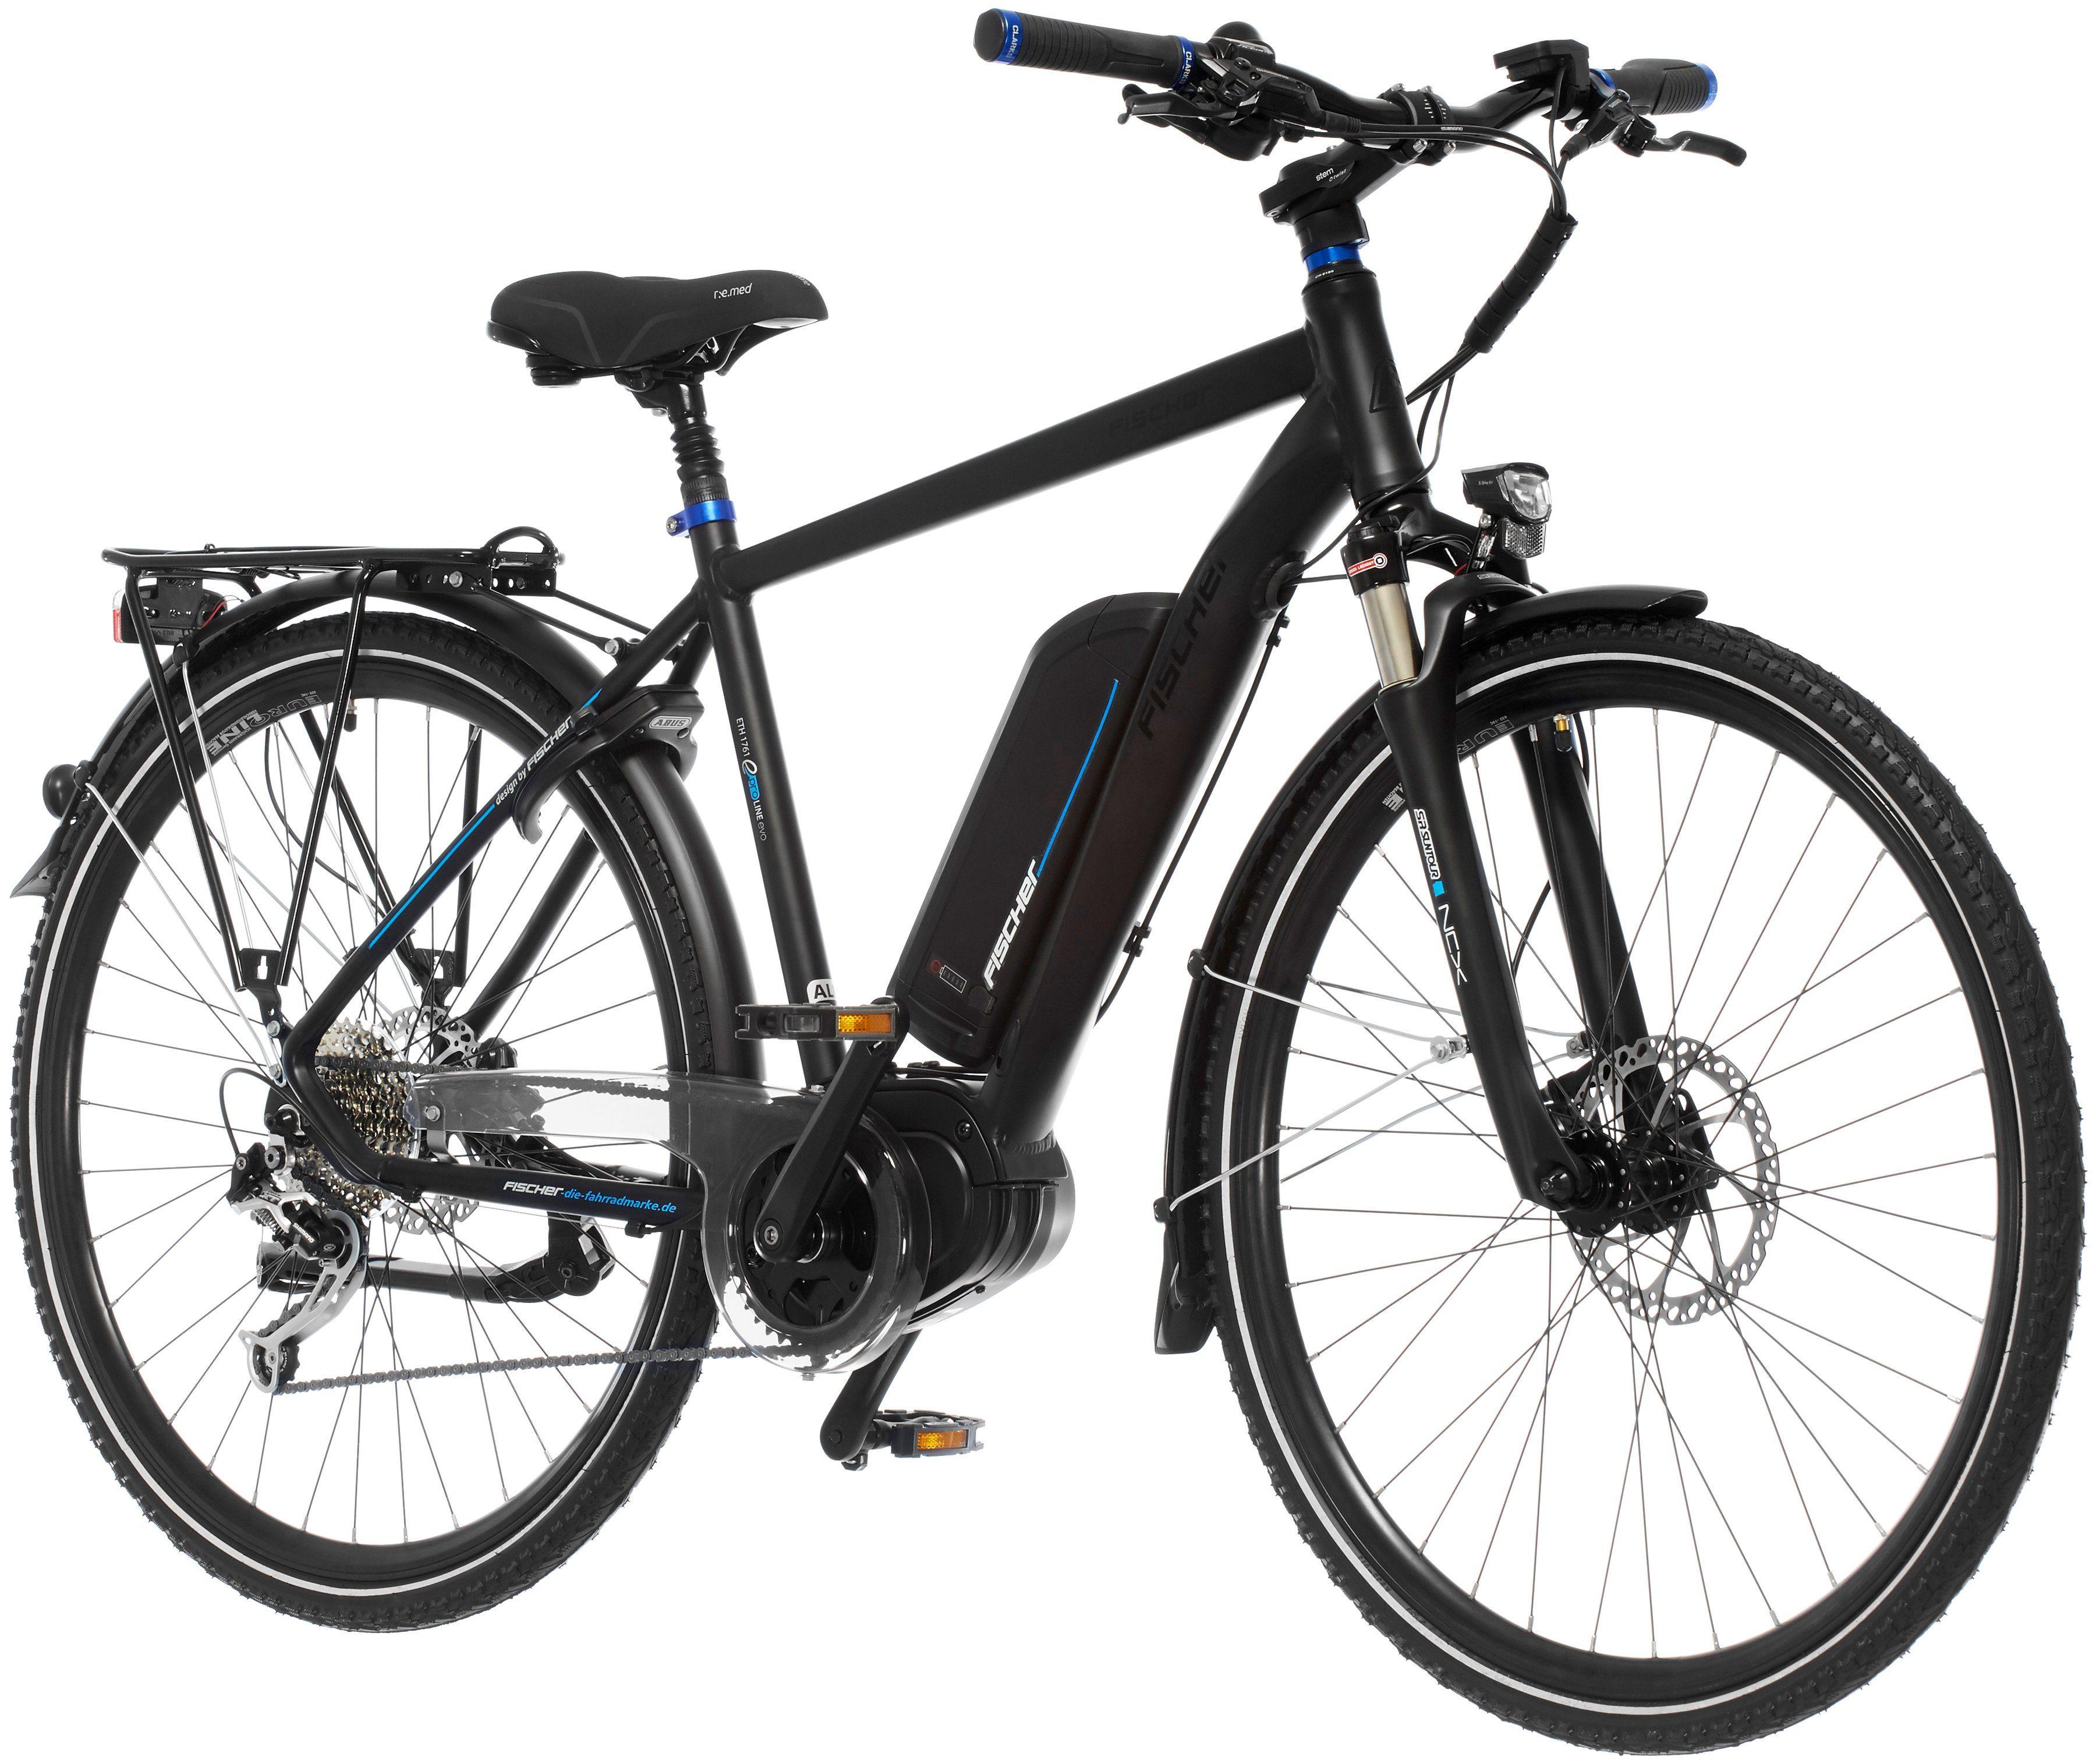 FISCHER FAHRRAEDER E-Bike Trekking Herren »ETH 1761«, 28 Zoll, 9 Gang, Mittelmotor, 557 Wh